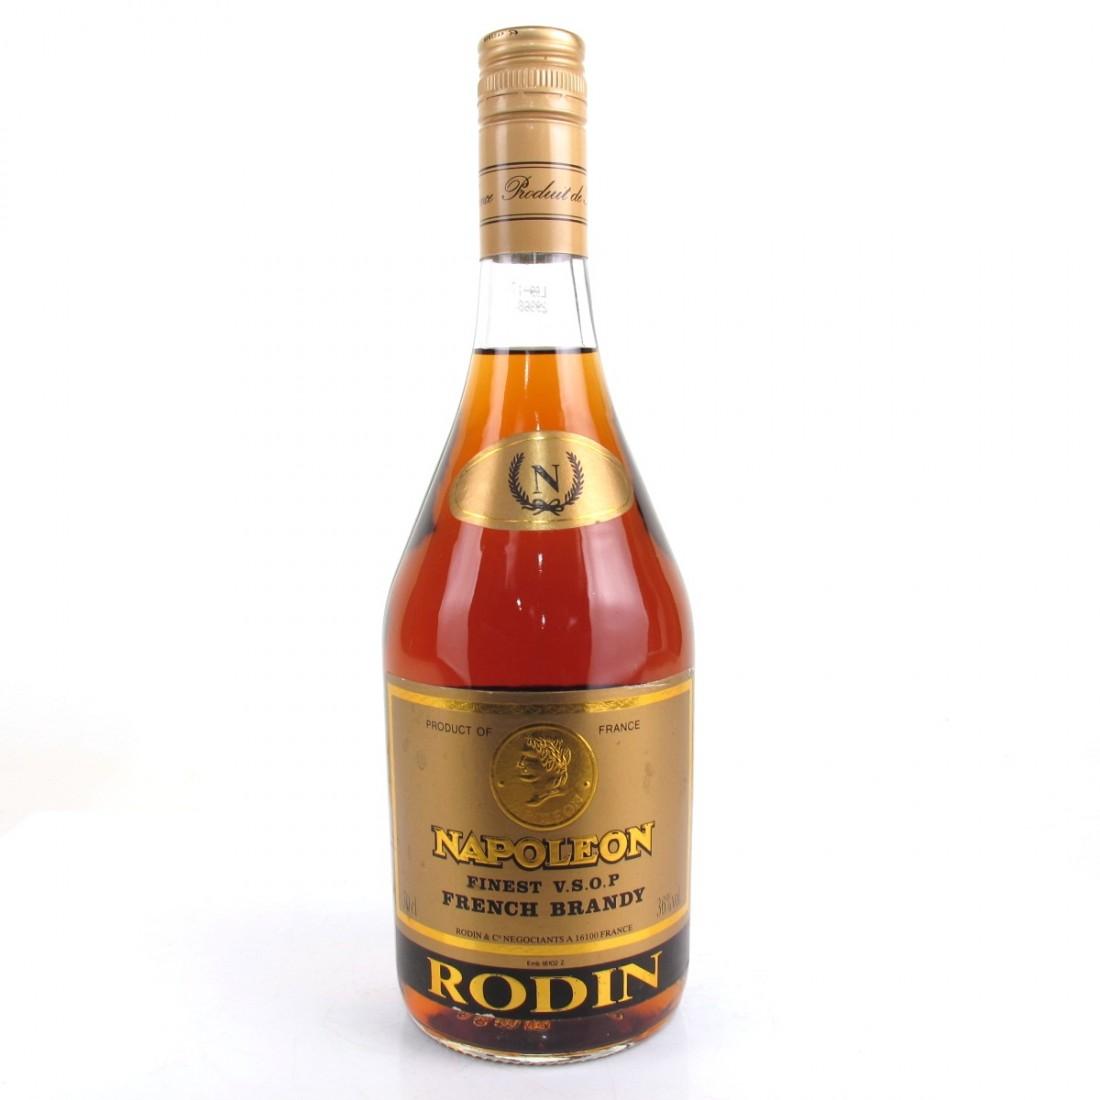 Rodin VSOP French Brandy